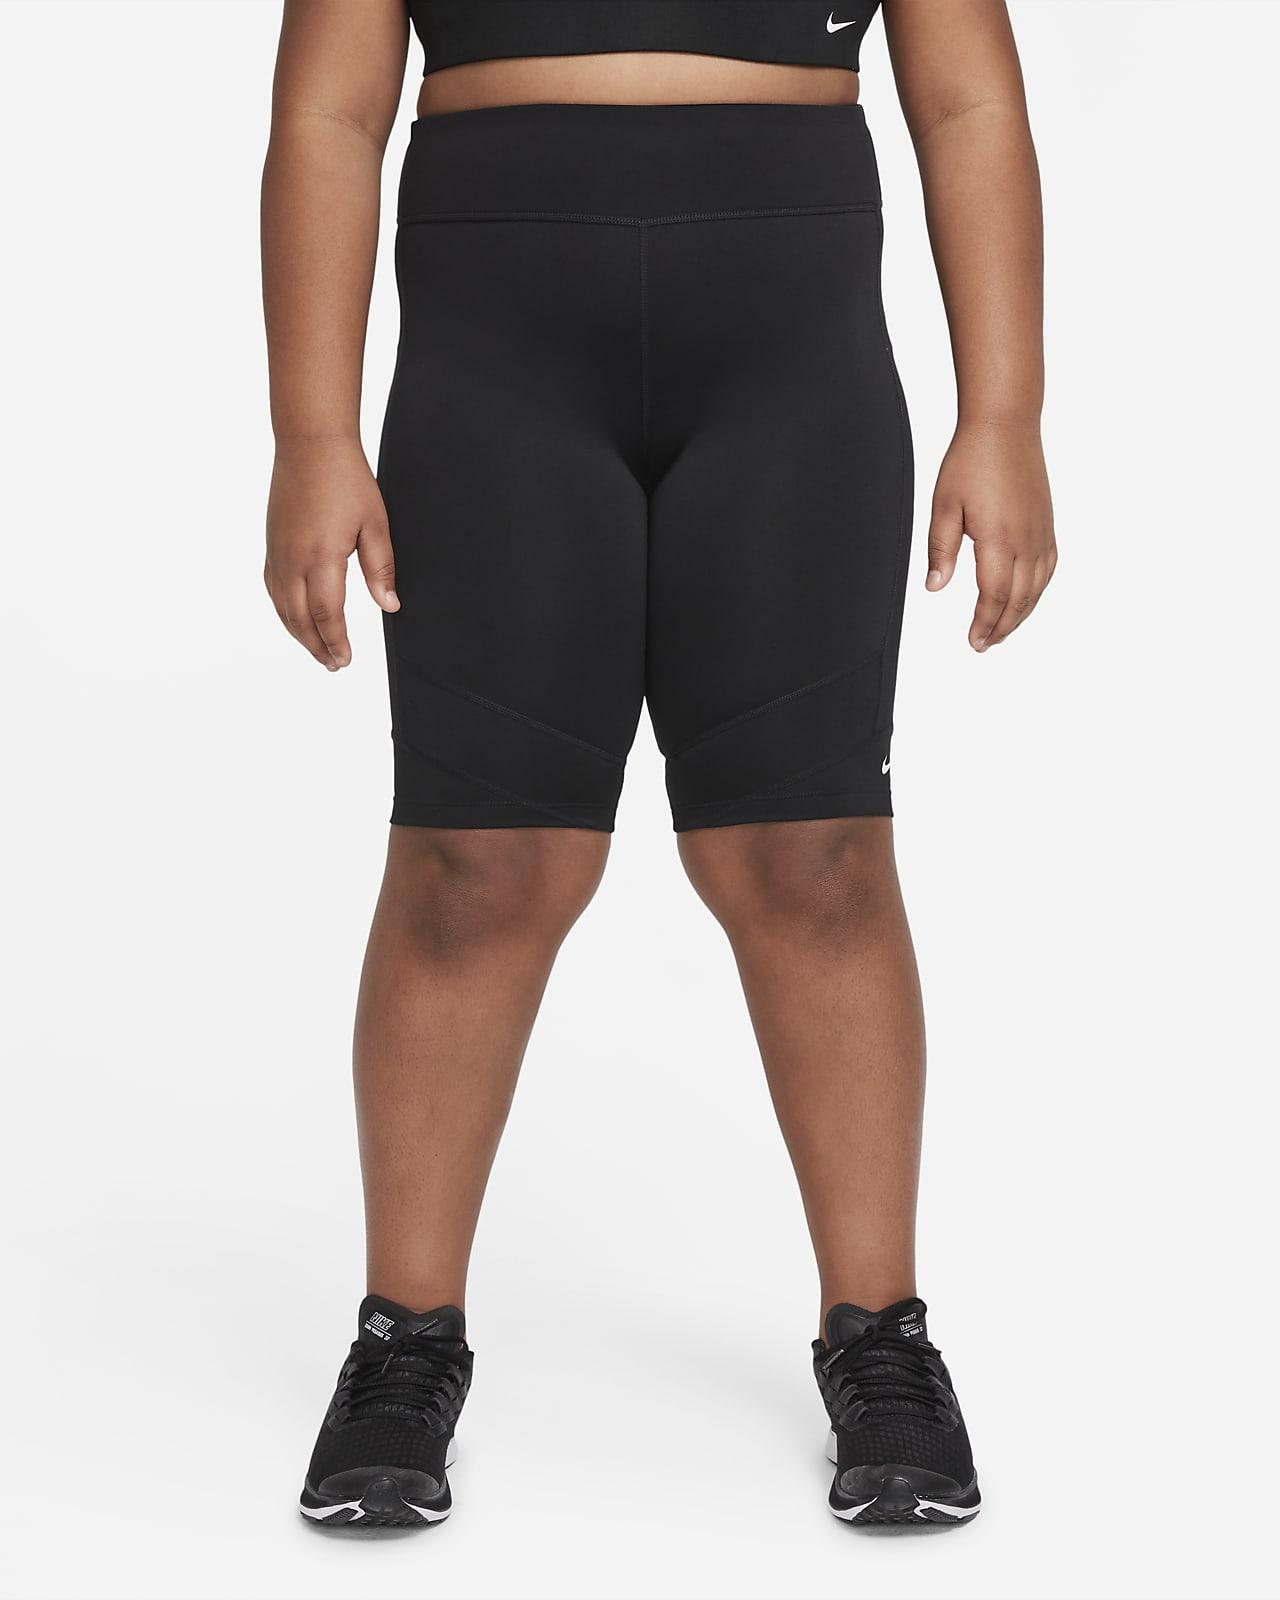 Nike Dri-FIT One Pantalons curts de ciclisme (Talla gran) - Nena